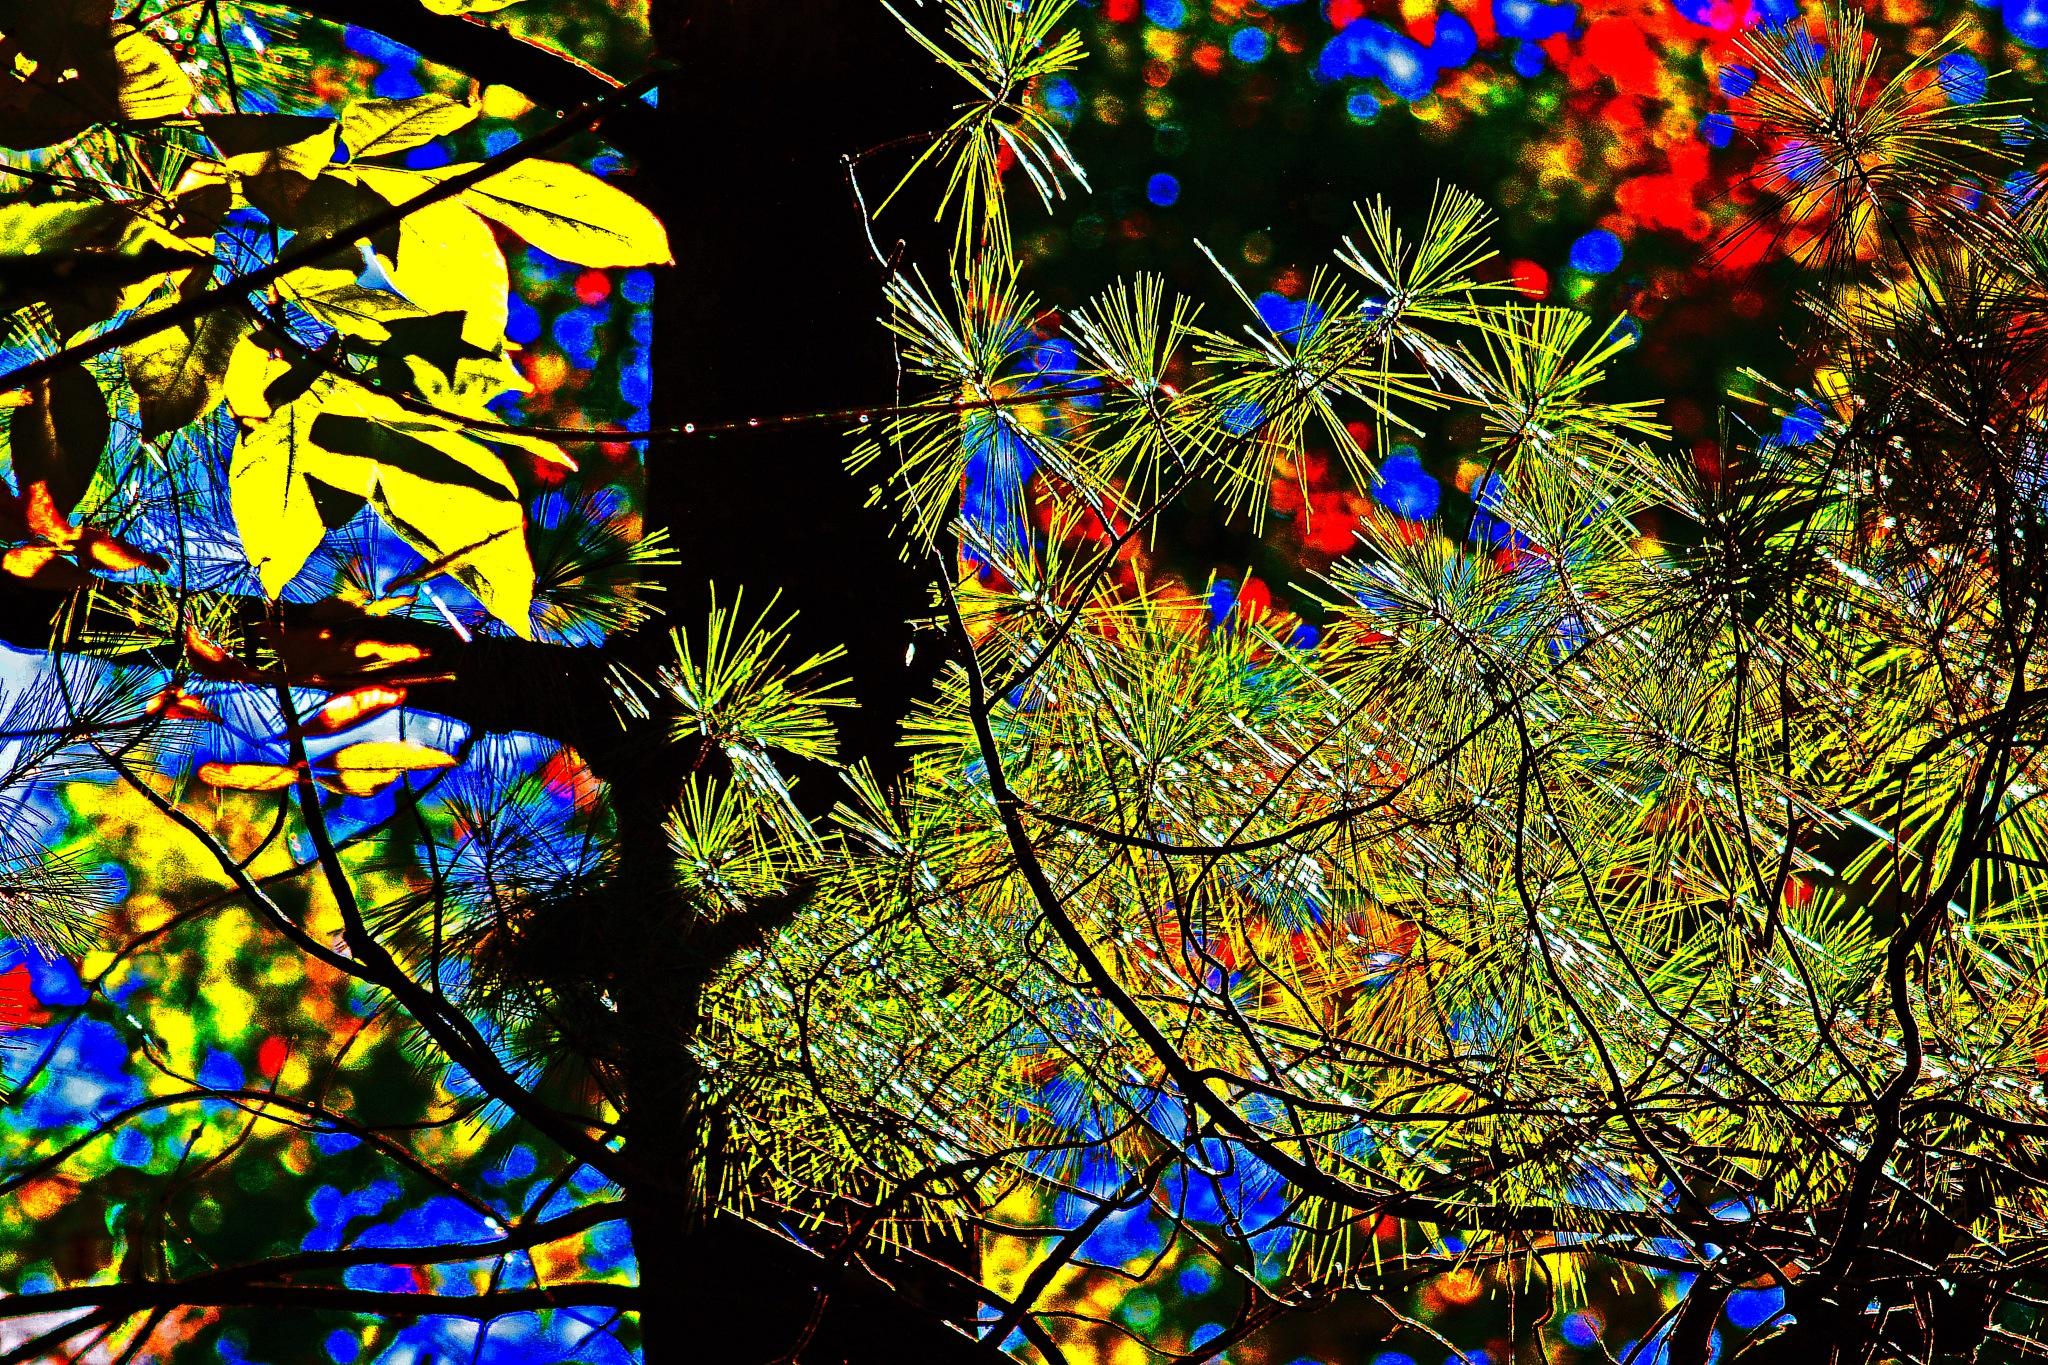 High-lighting by William C. Burton